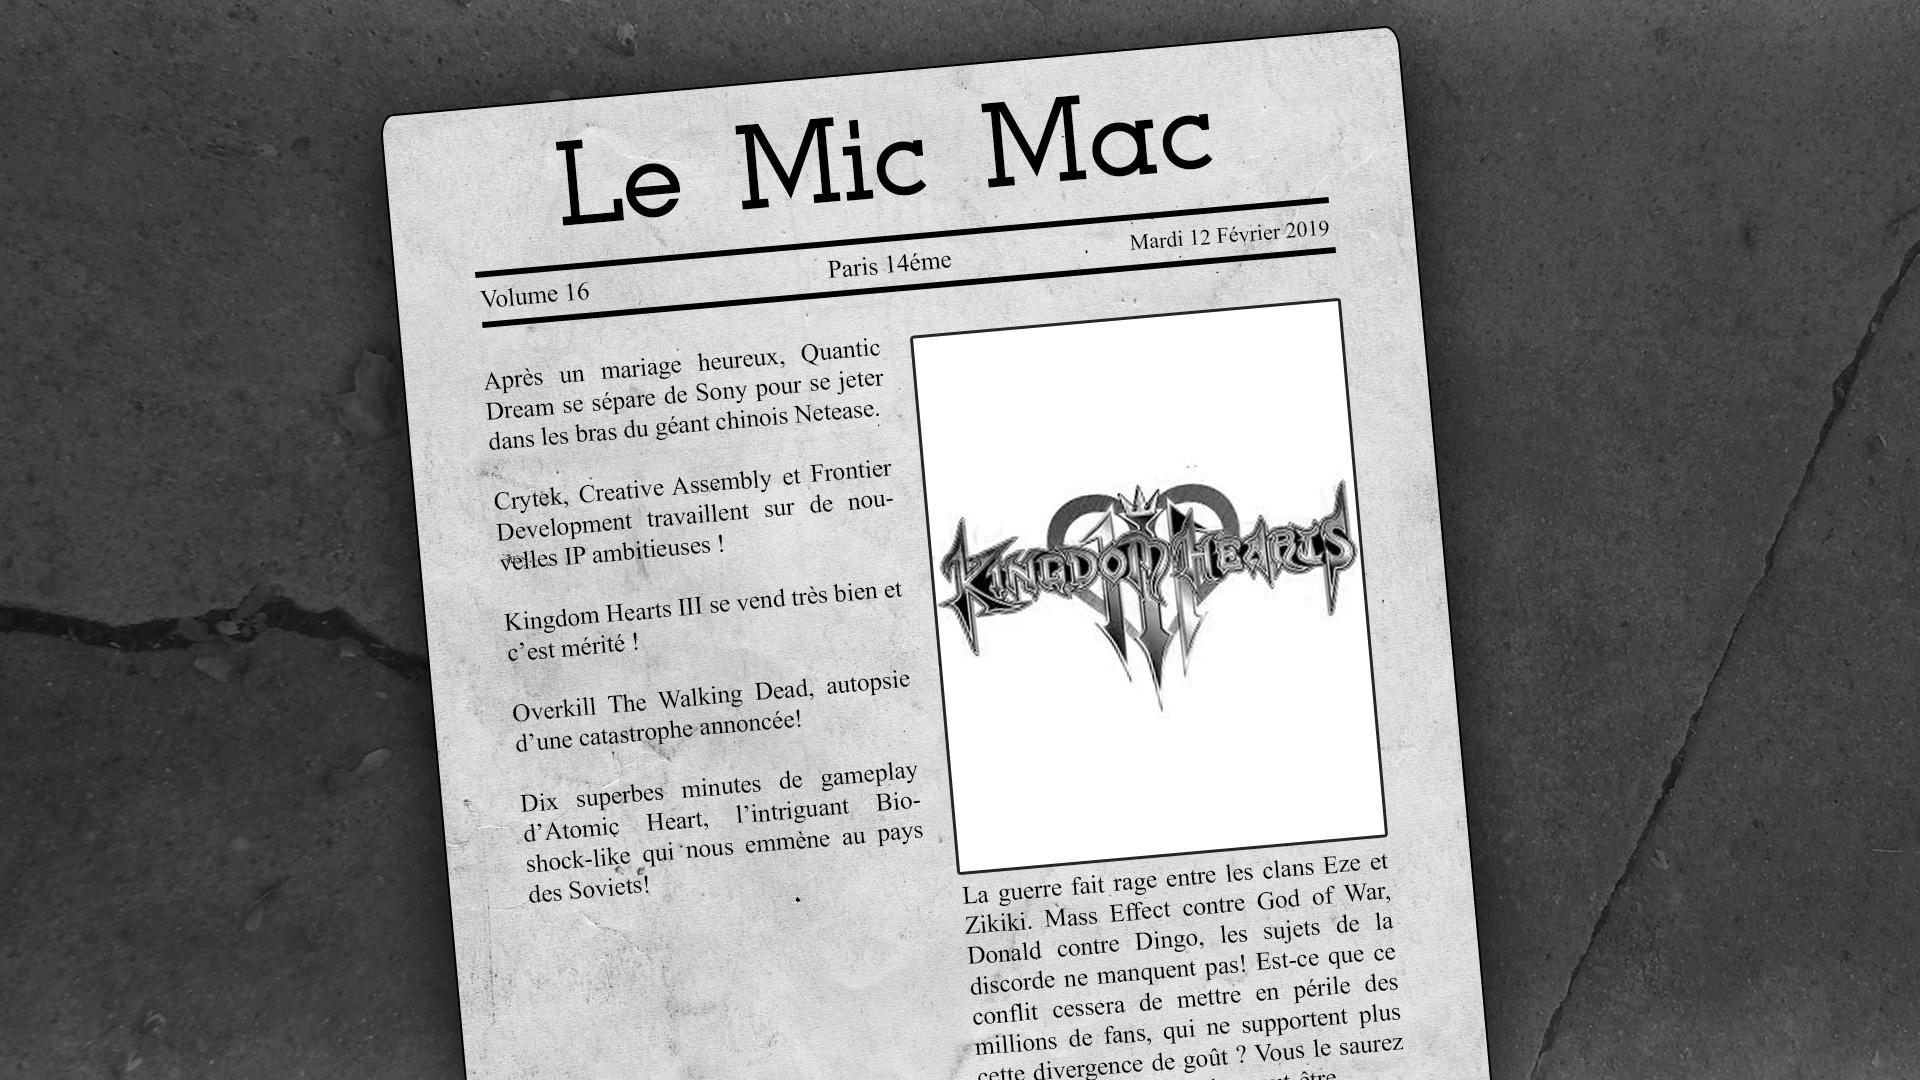 Au Tour du Mic – Mic Mac #16 : 22/01/2019 AU 12/02/2019